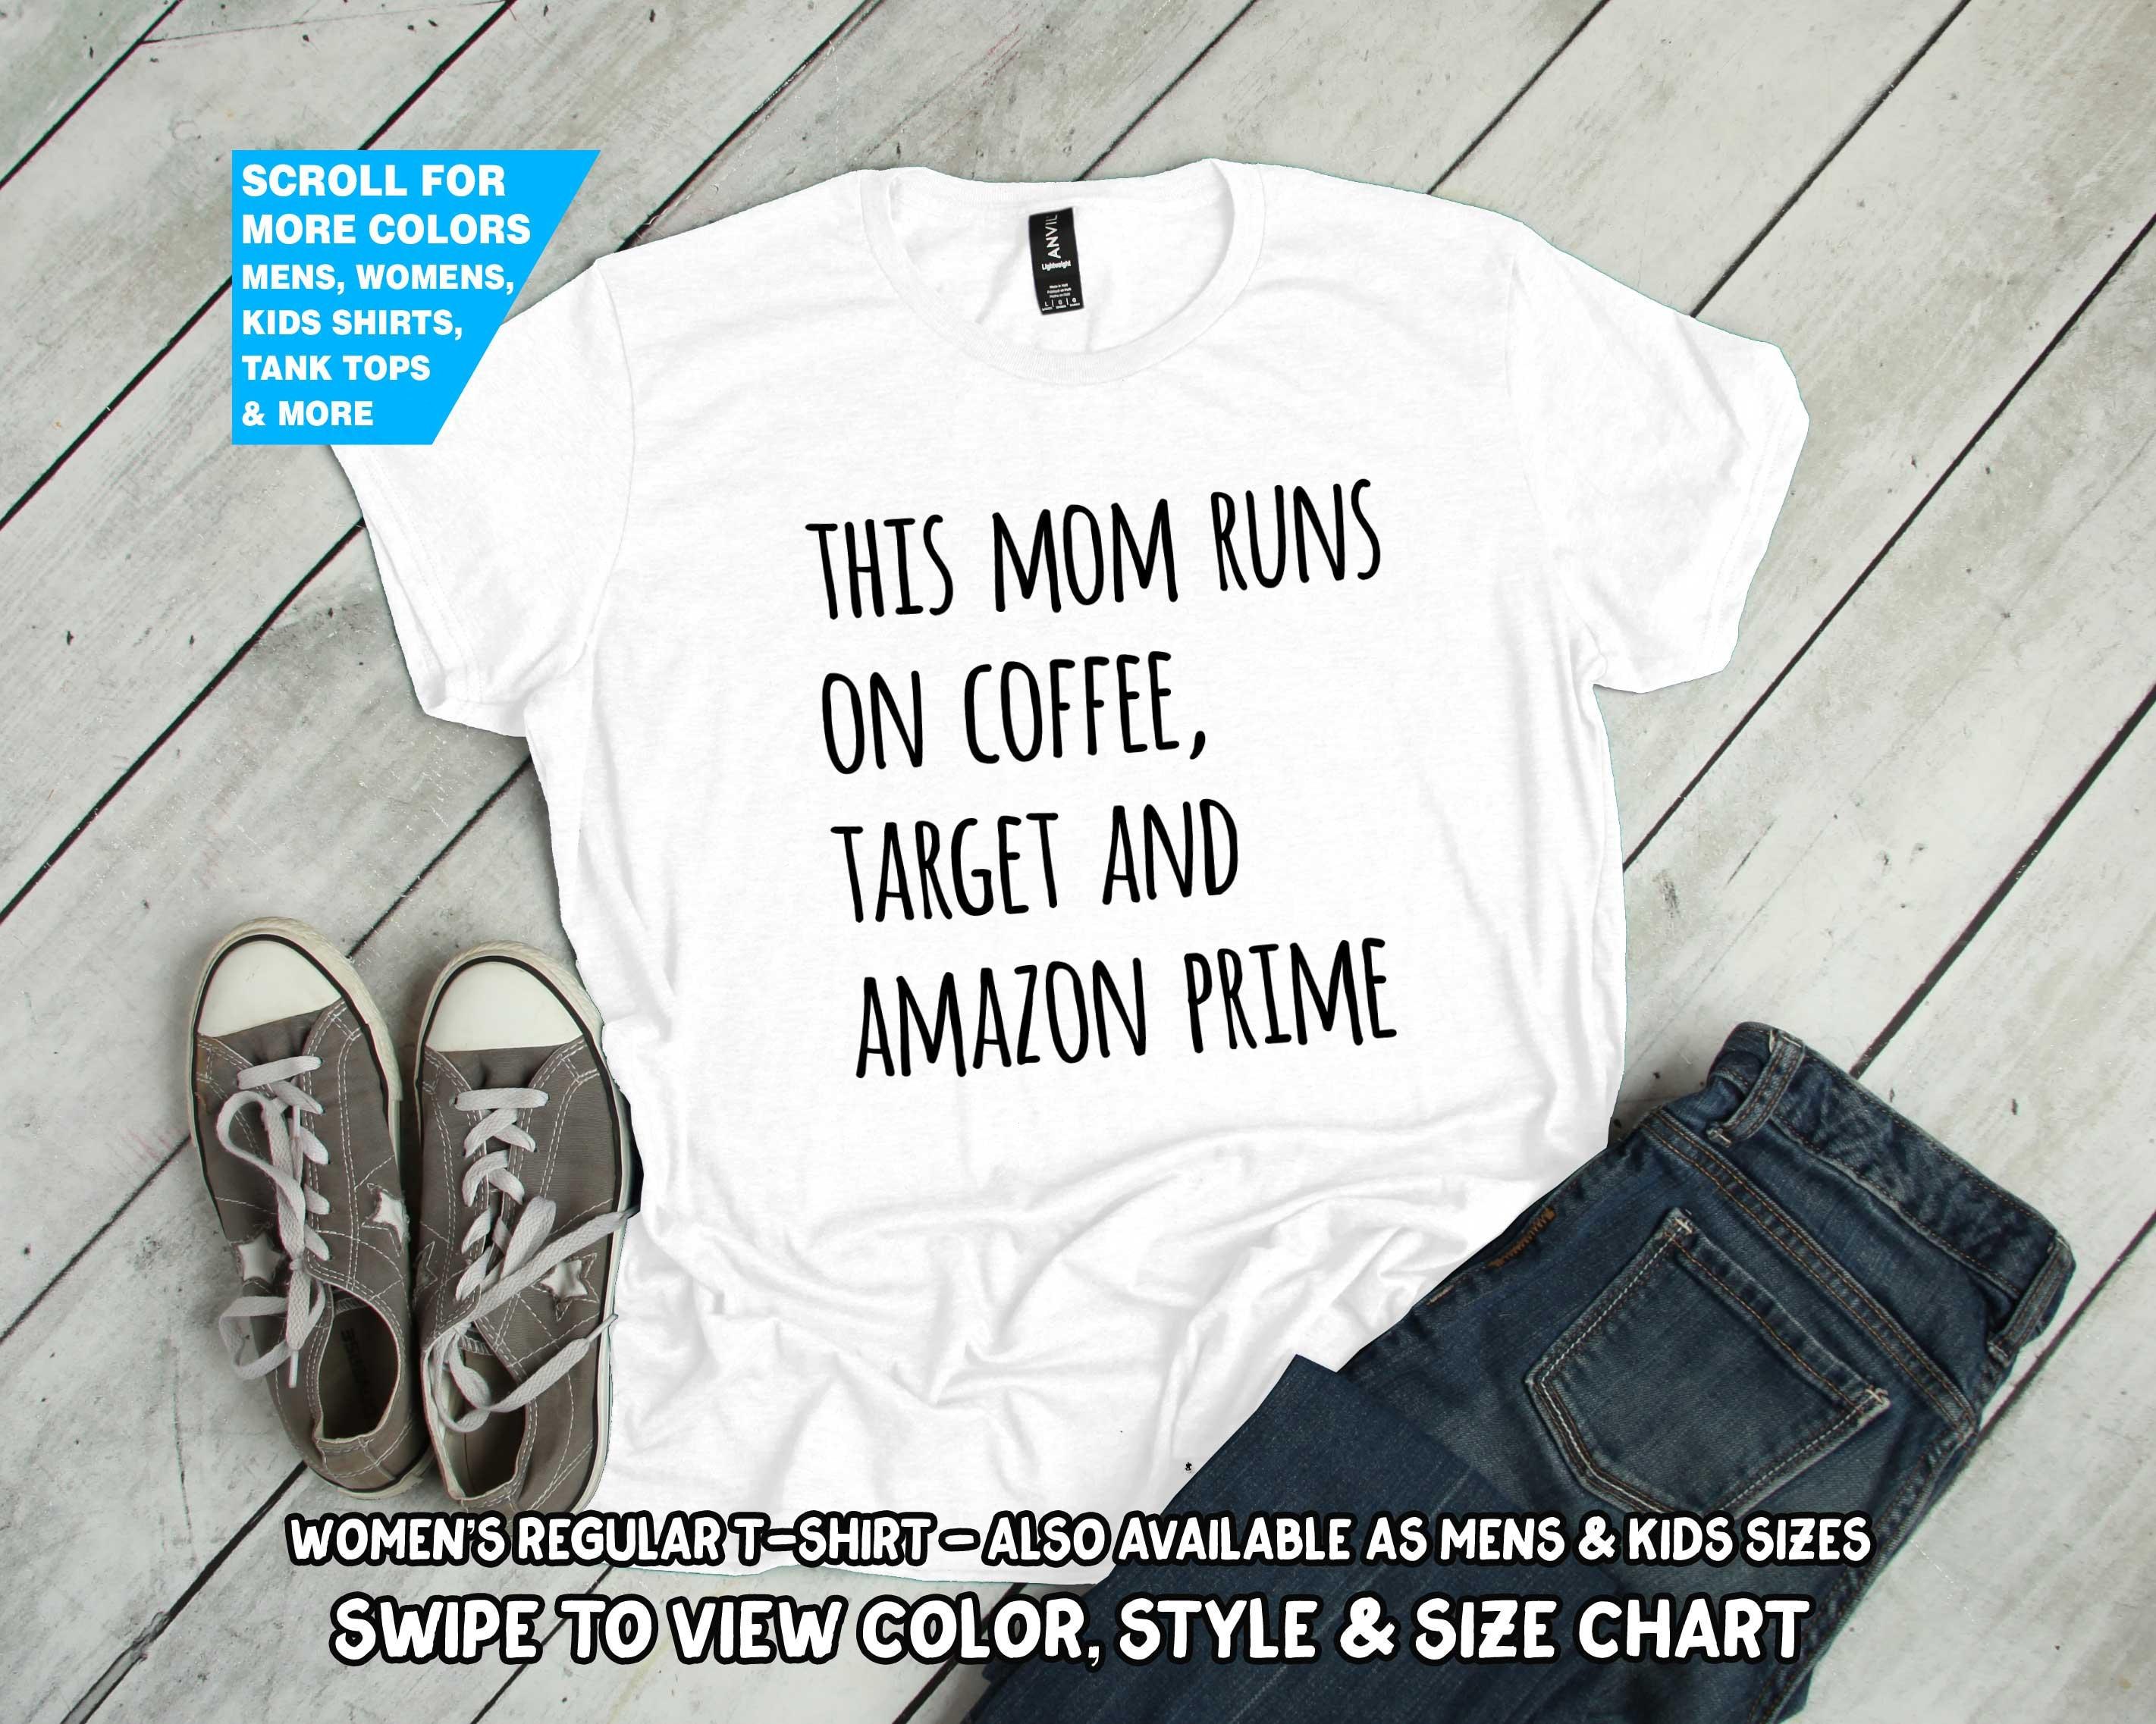 This Mom Runs Prime On Coffee Target And Amazon Prime Runs Shirt